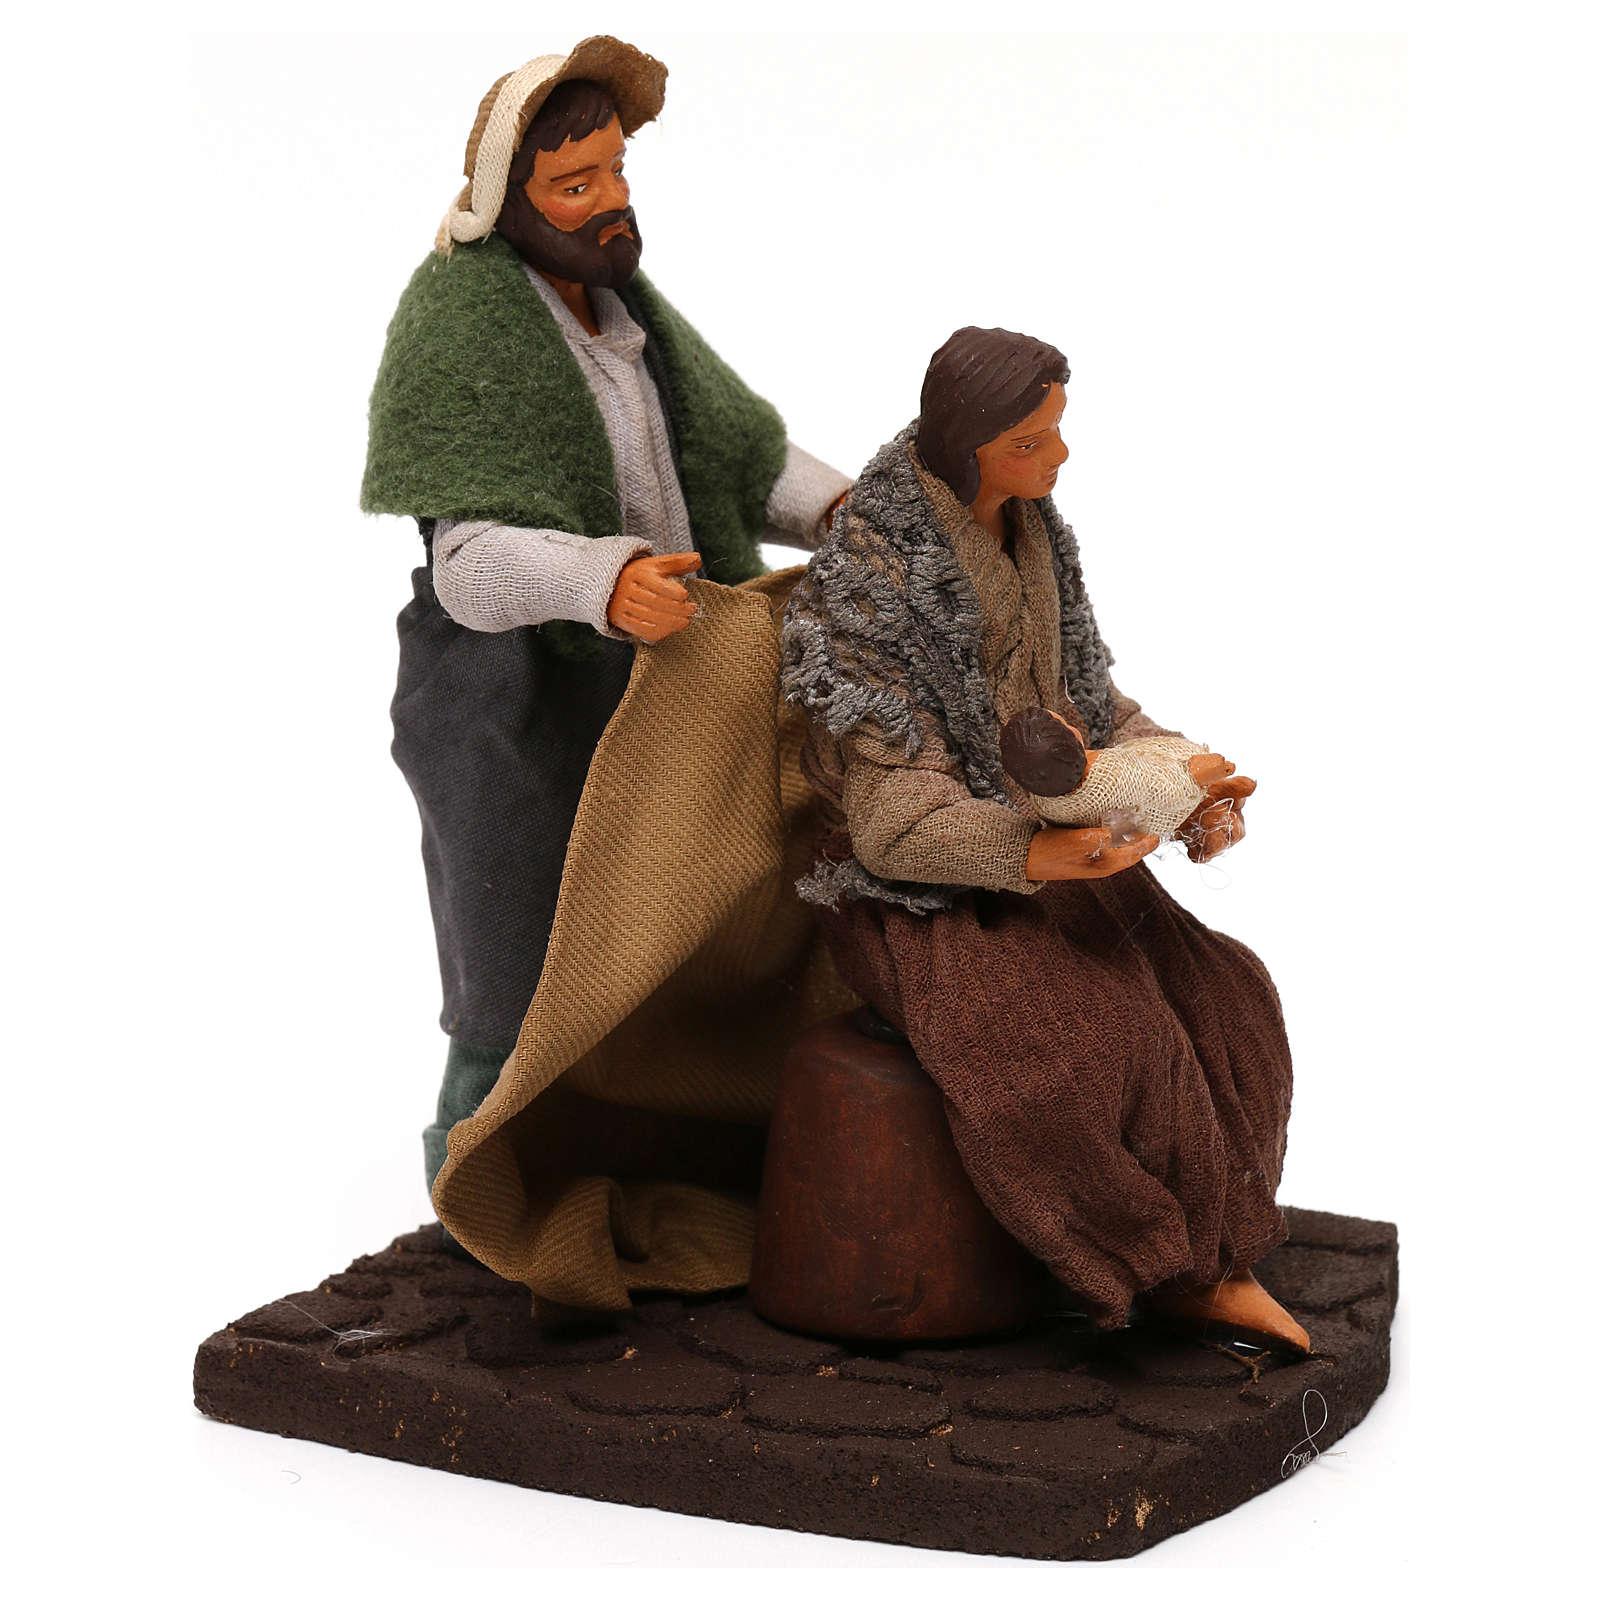 Man covering wife and baby, Neapolitan Nativity scene 10 cm 4